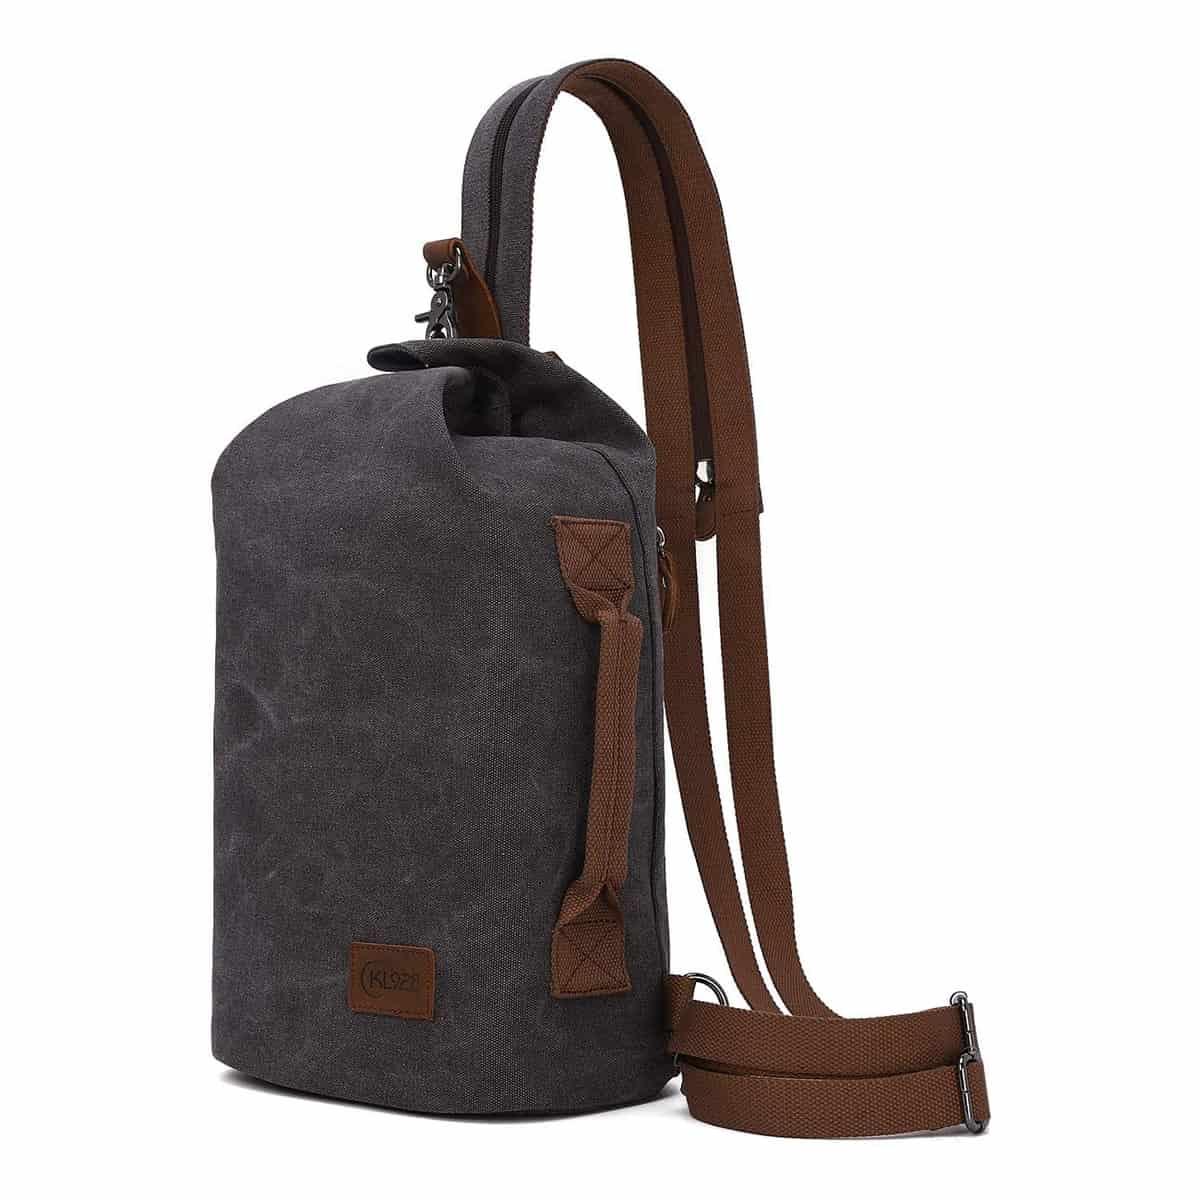 KL928-Casual-Sling-Bag